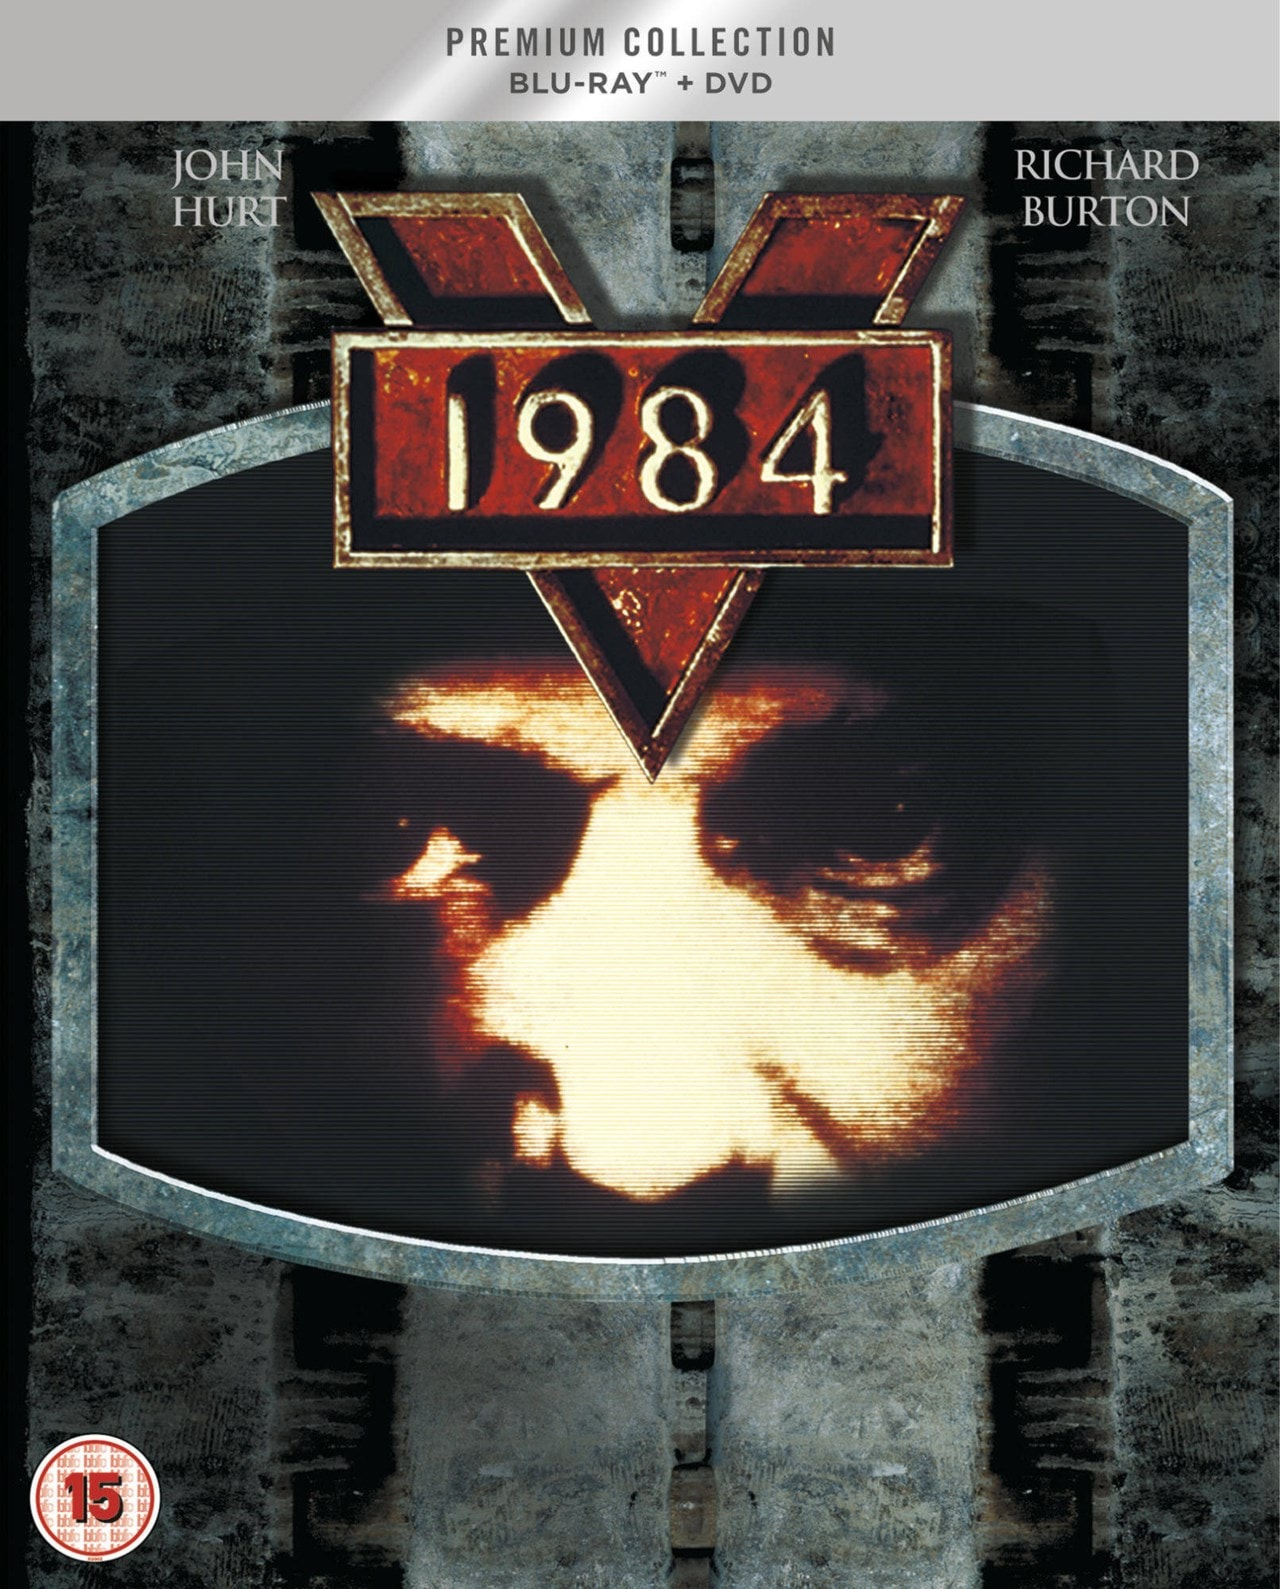 1984 (hmv Exclusive - The Premium Collection) - 2